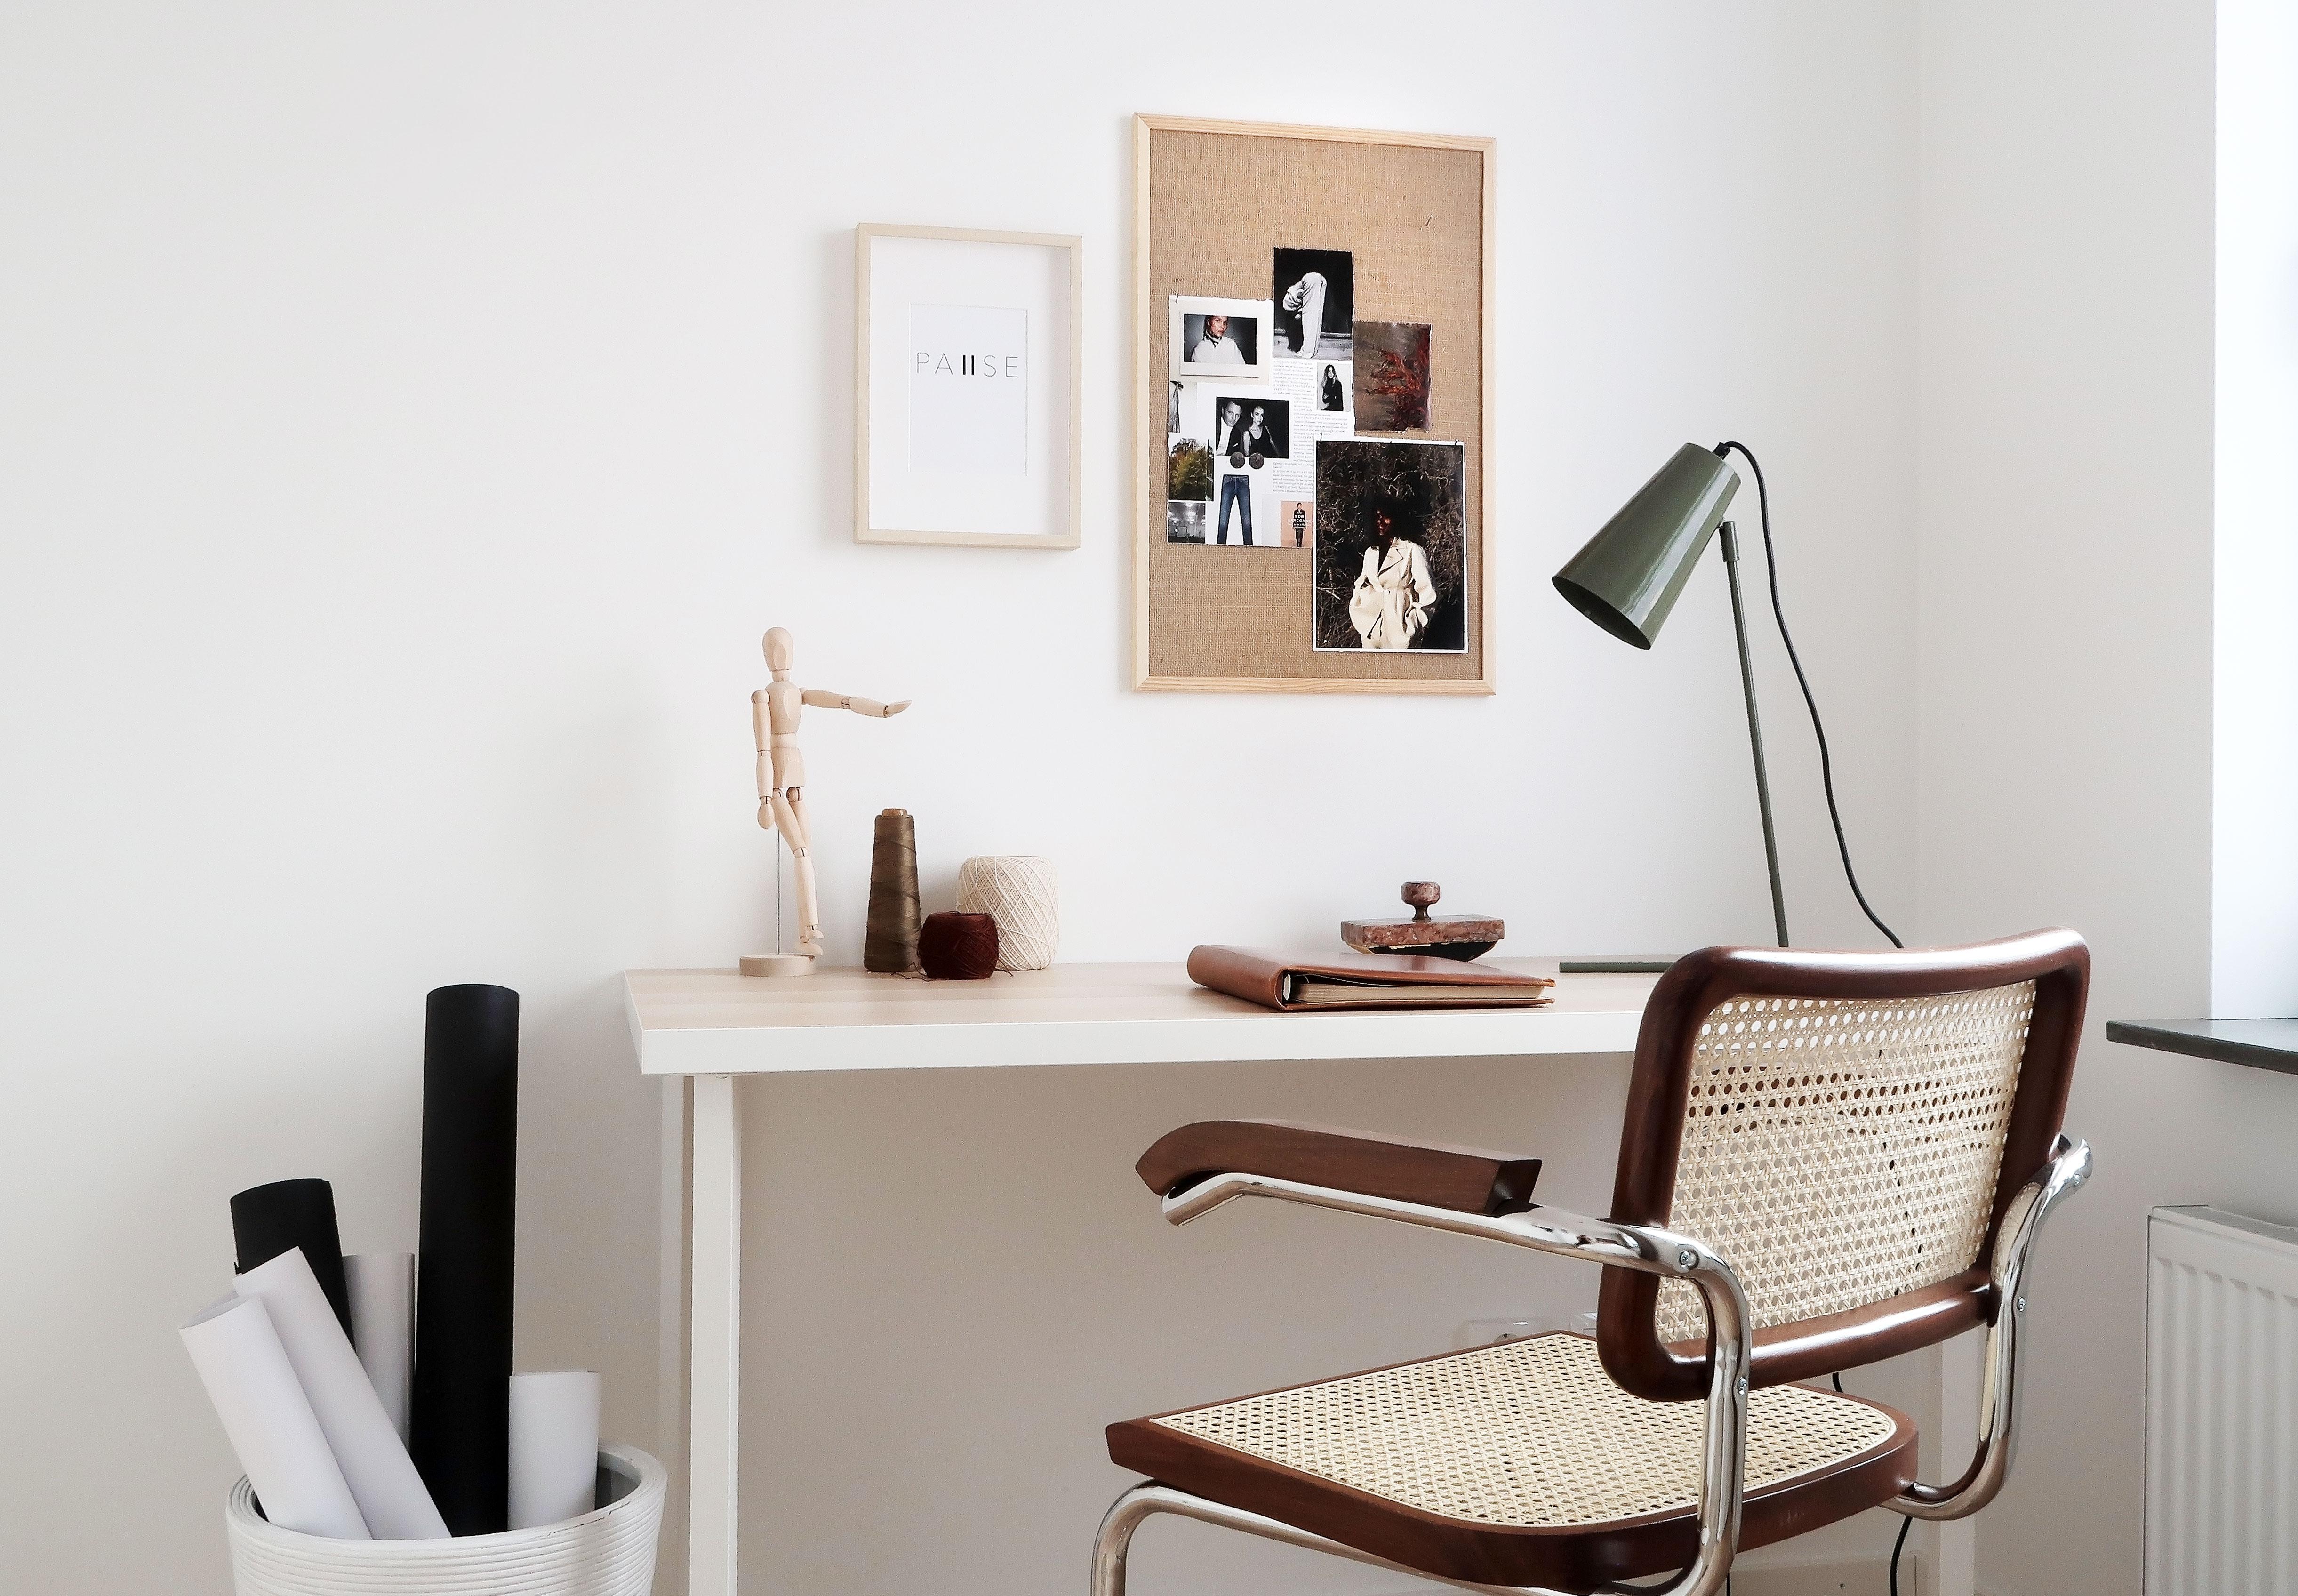 JM-slussen-sovrum-bedroom-interior-6